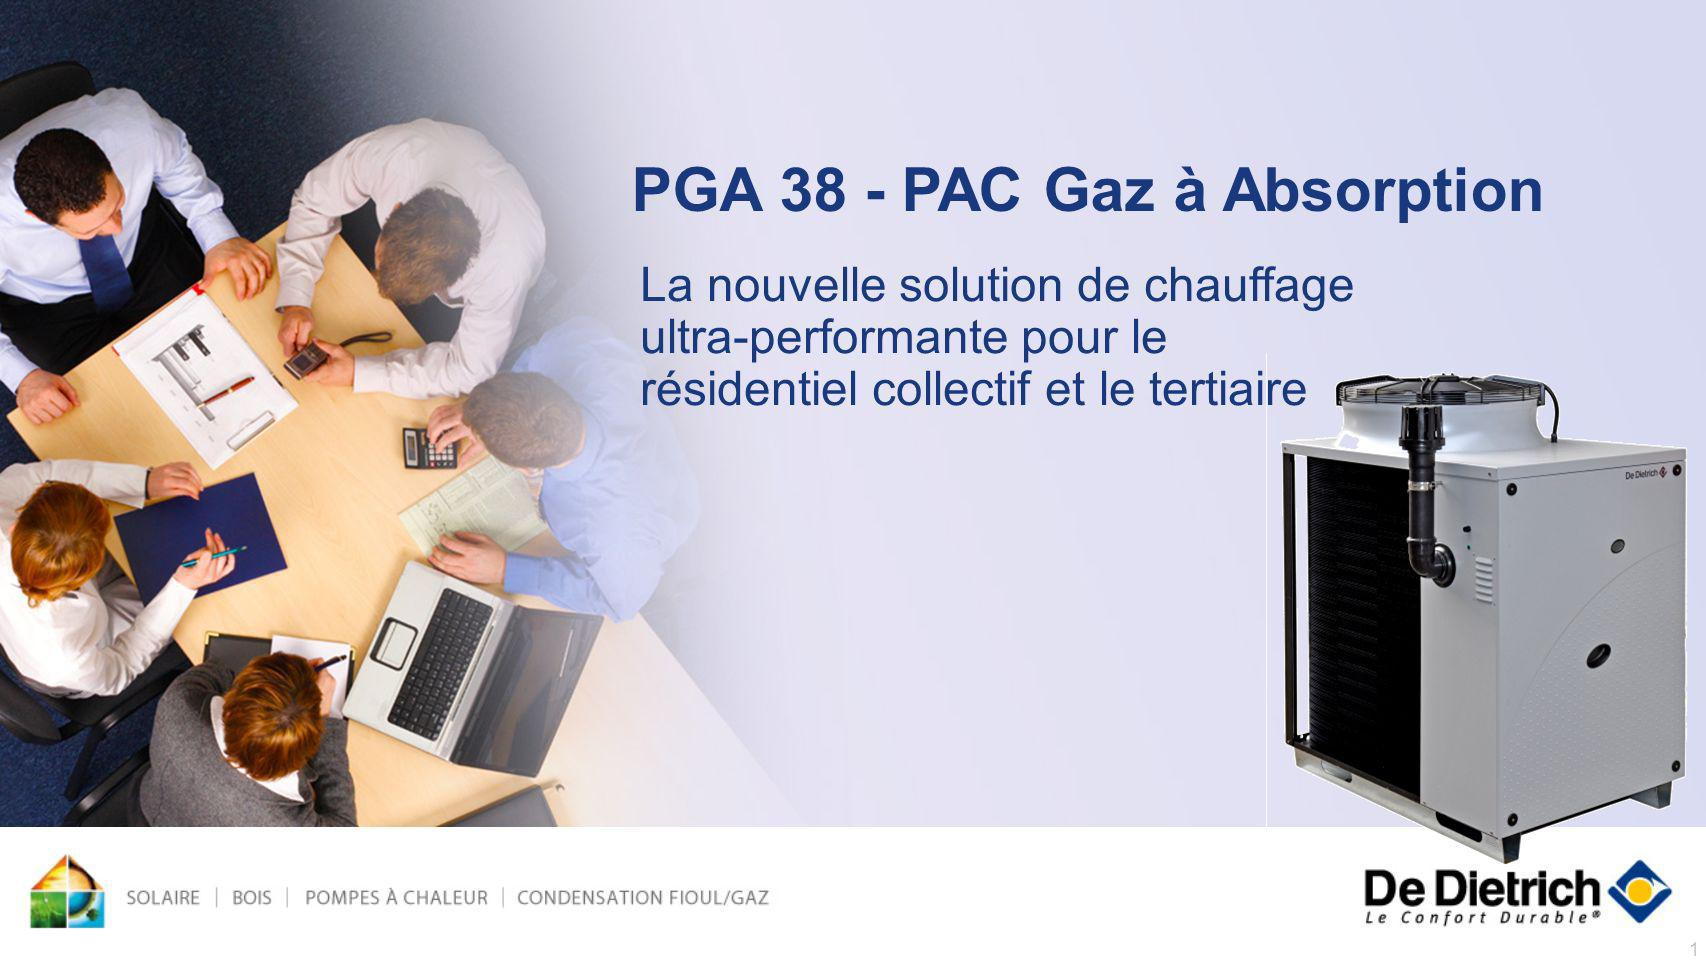 PGA 38 - PAC Gaz à Absorption